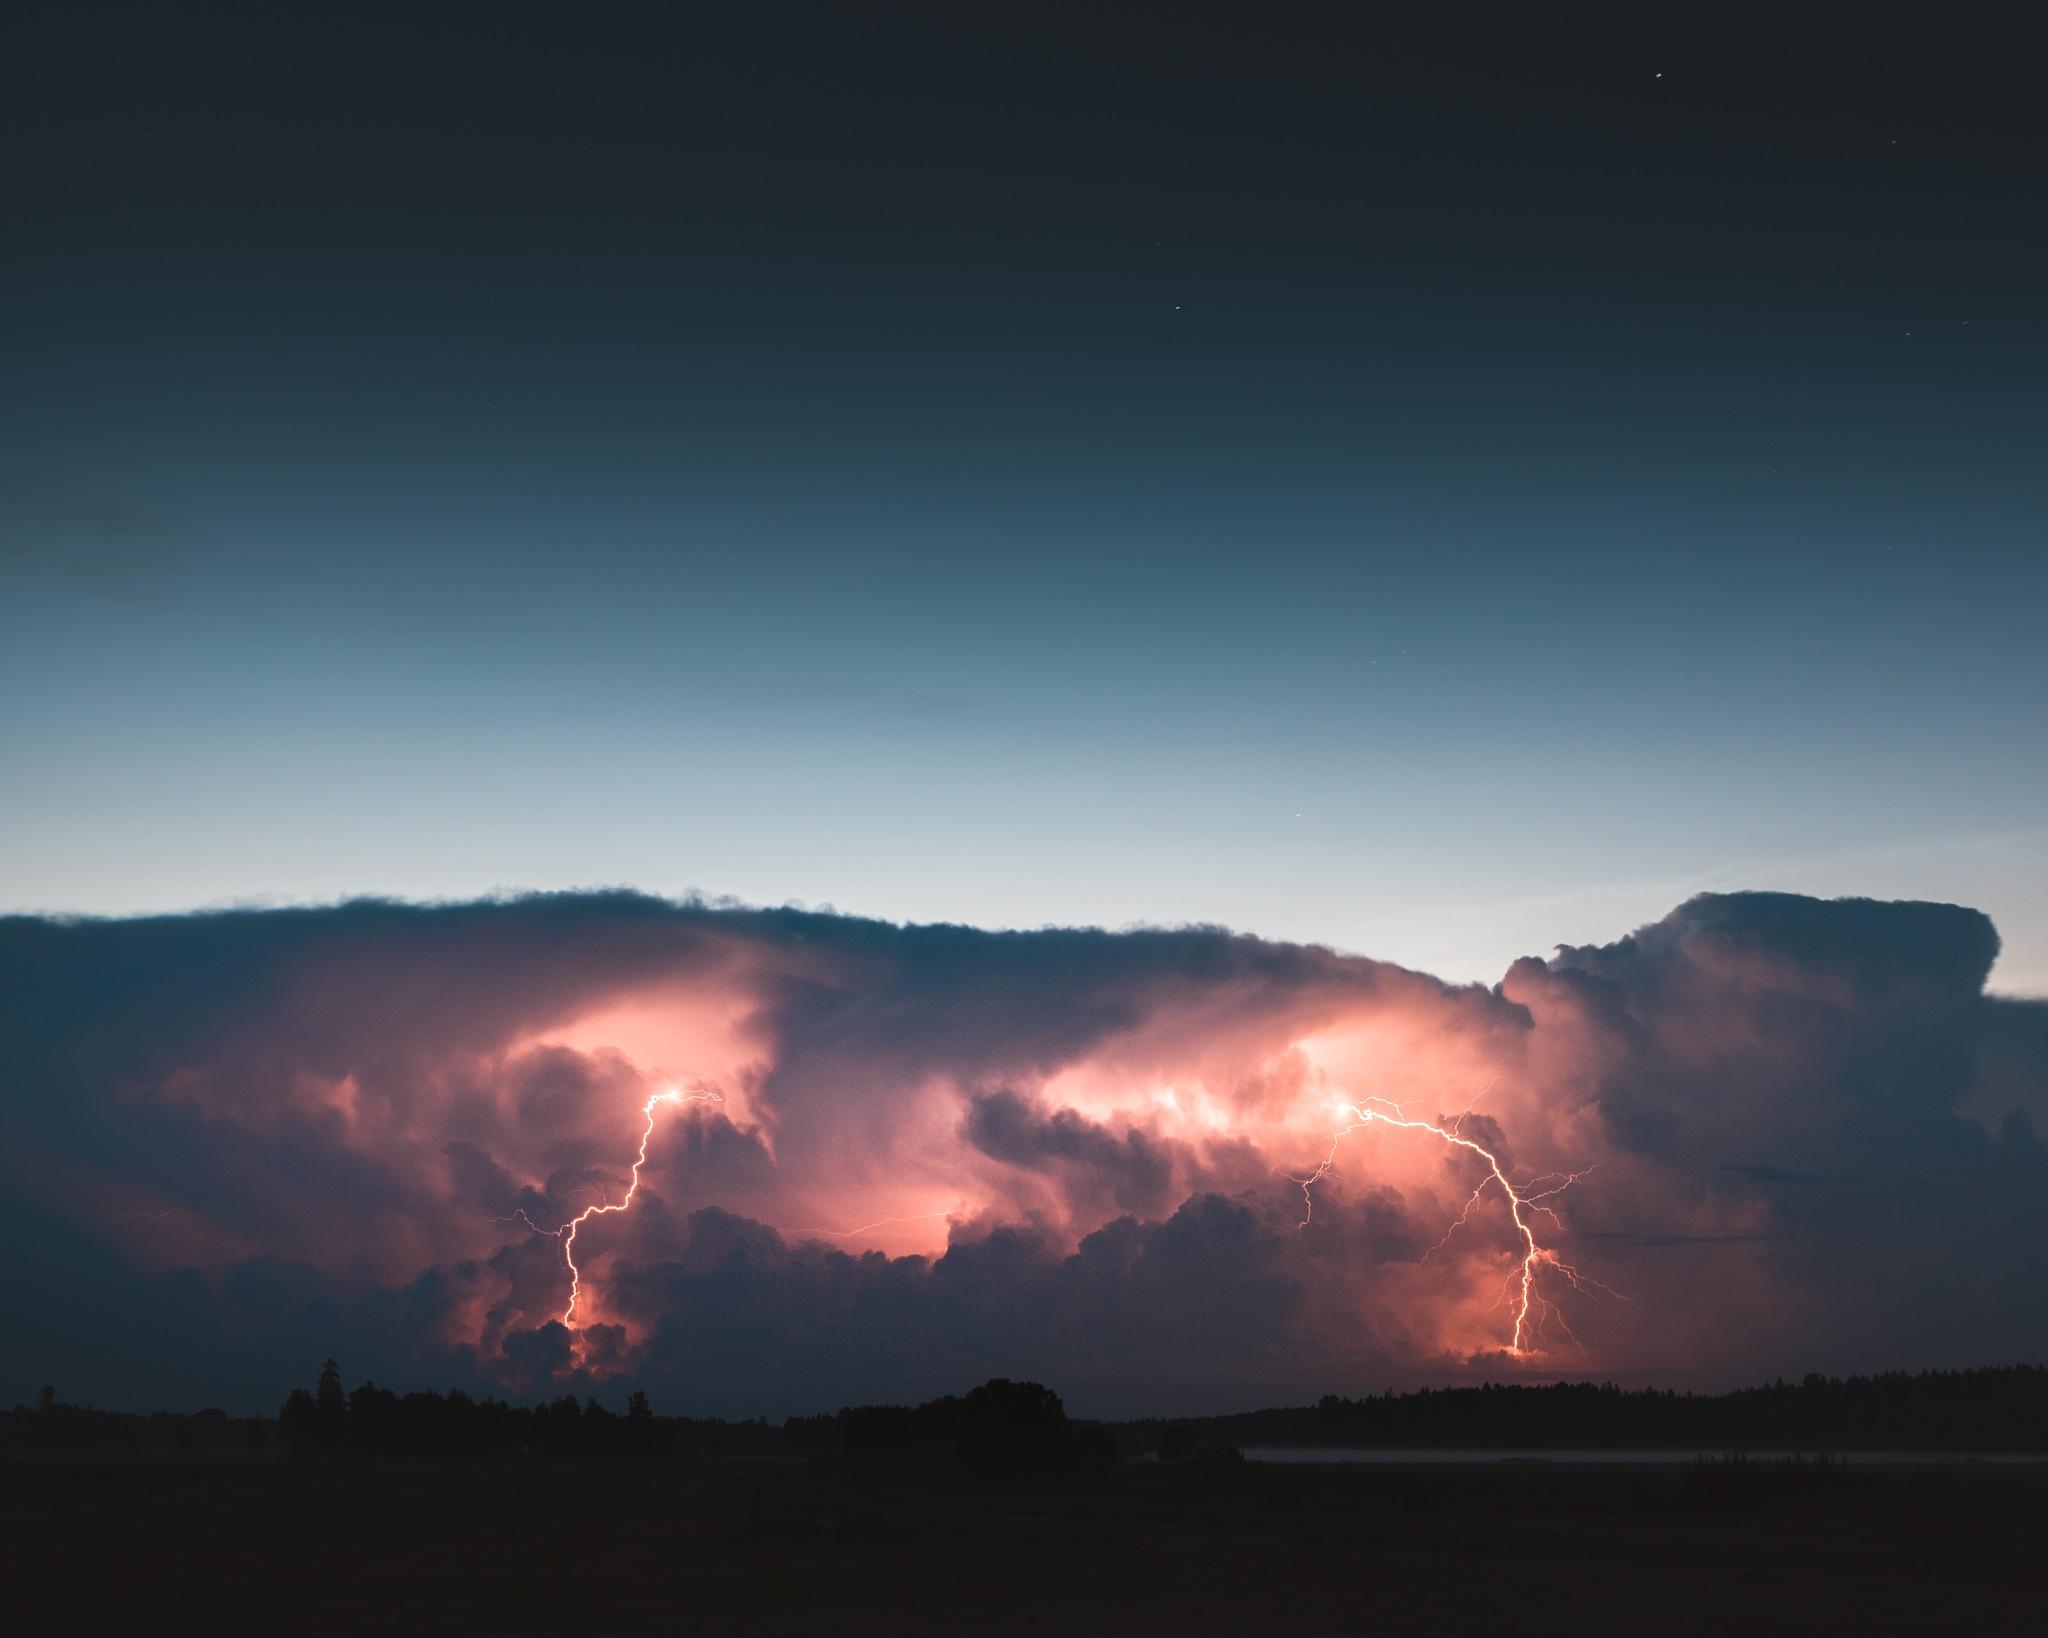 Lightning by Nicholas Aspholm